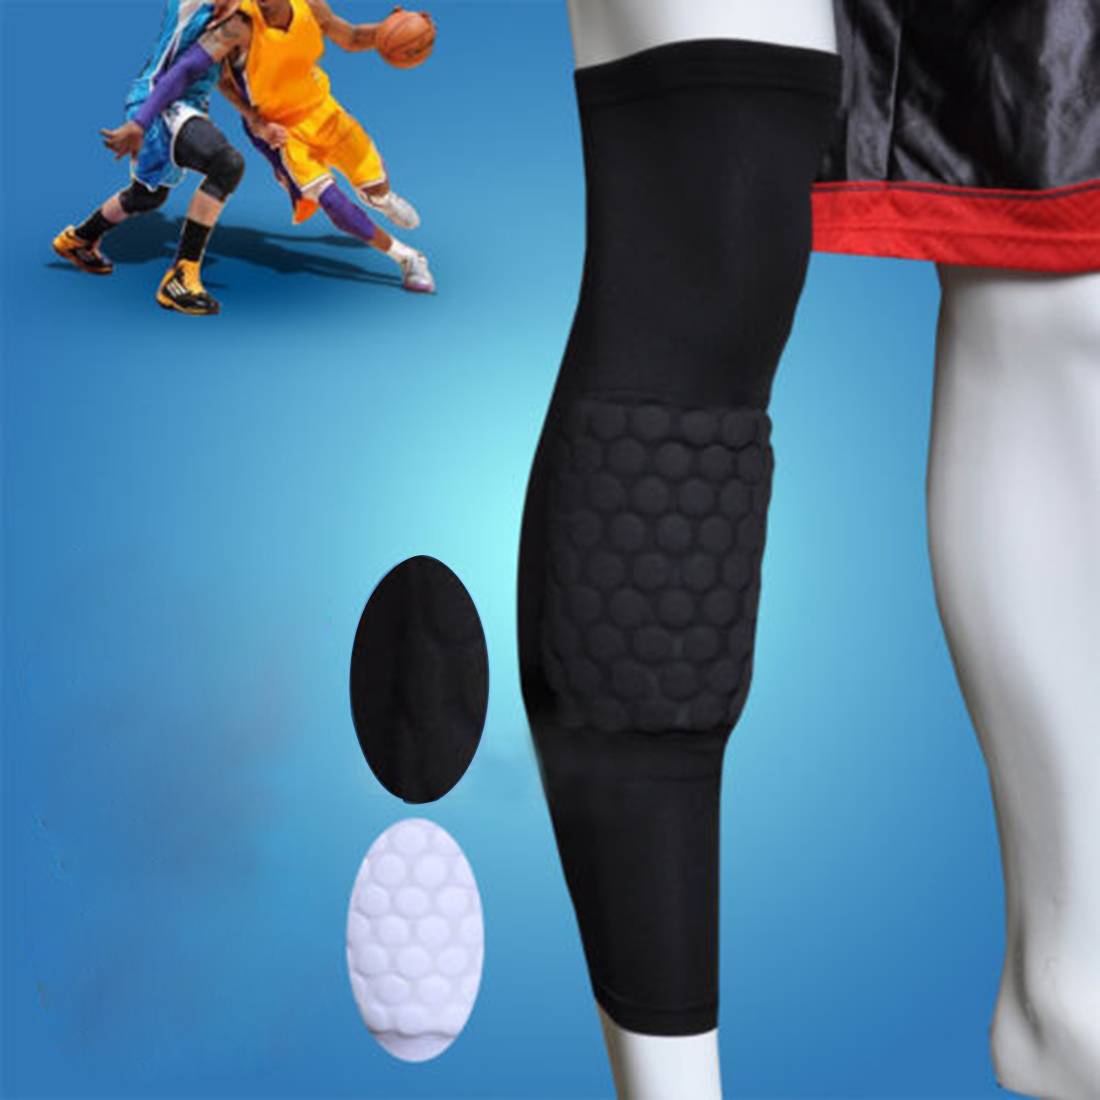 Basketball Knee Pads Upgrated Honeycomb Knee Pad